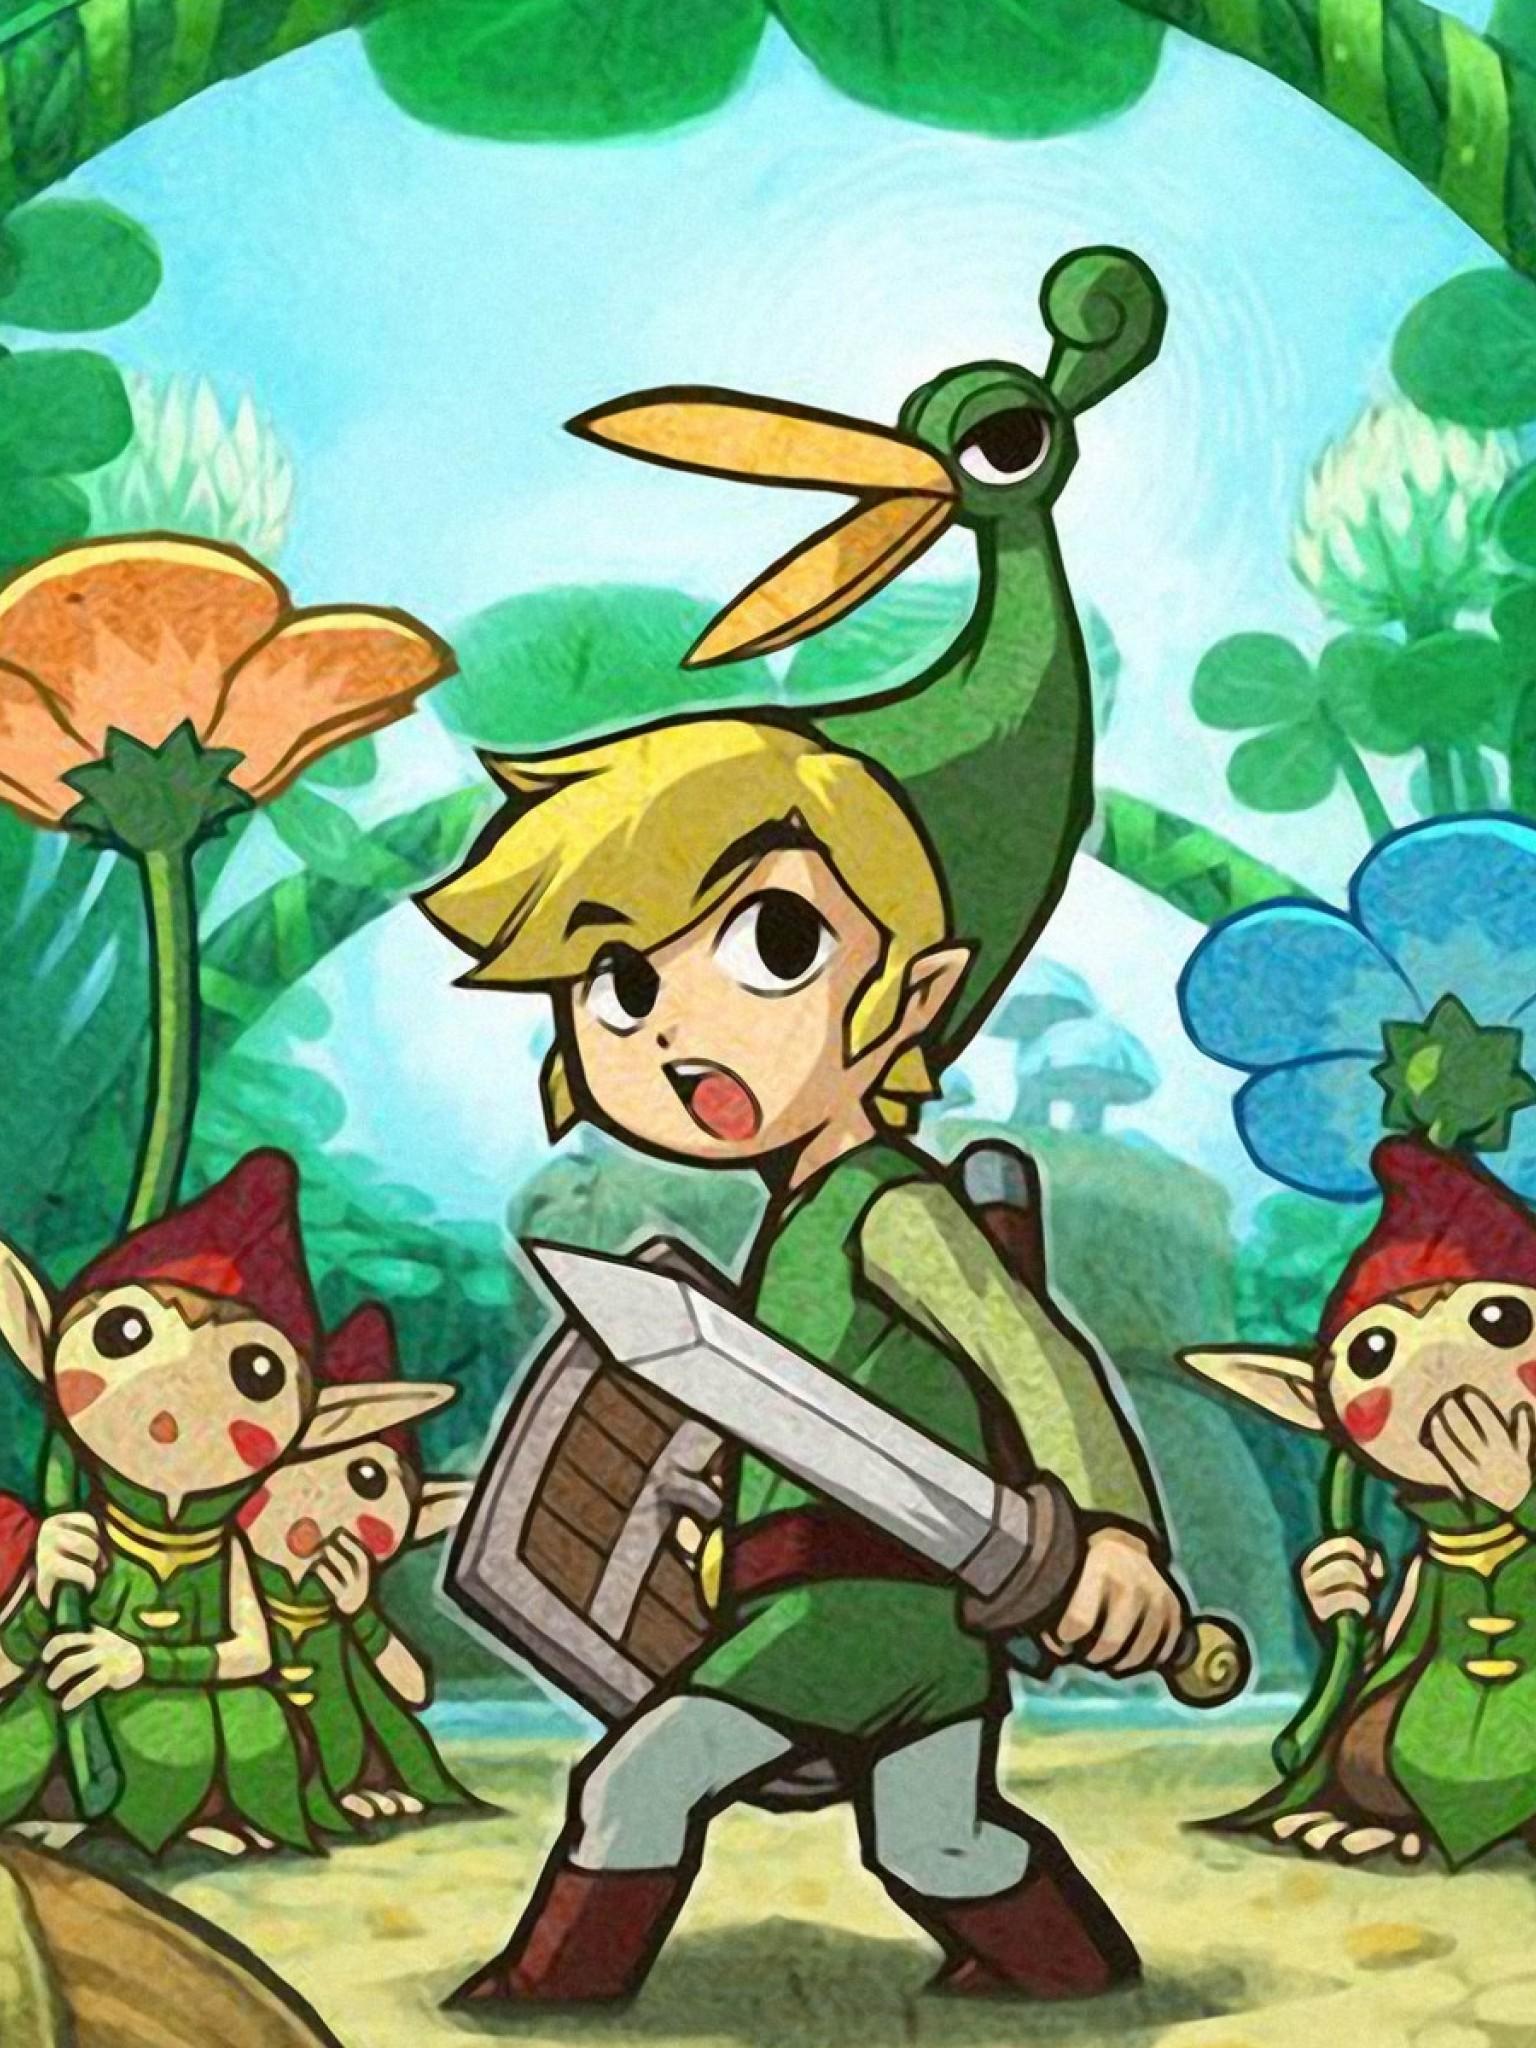 Legend Of Zelda Minish Cap Picori - HD Wallpaper